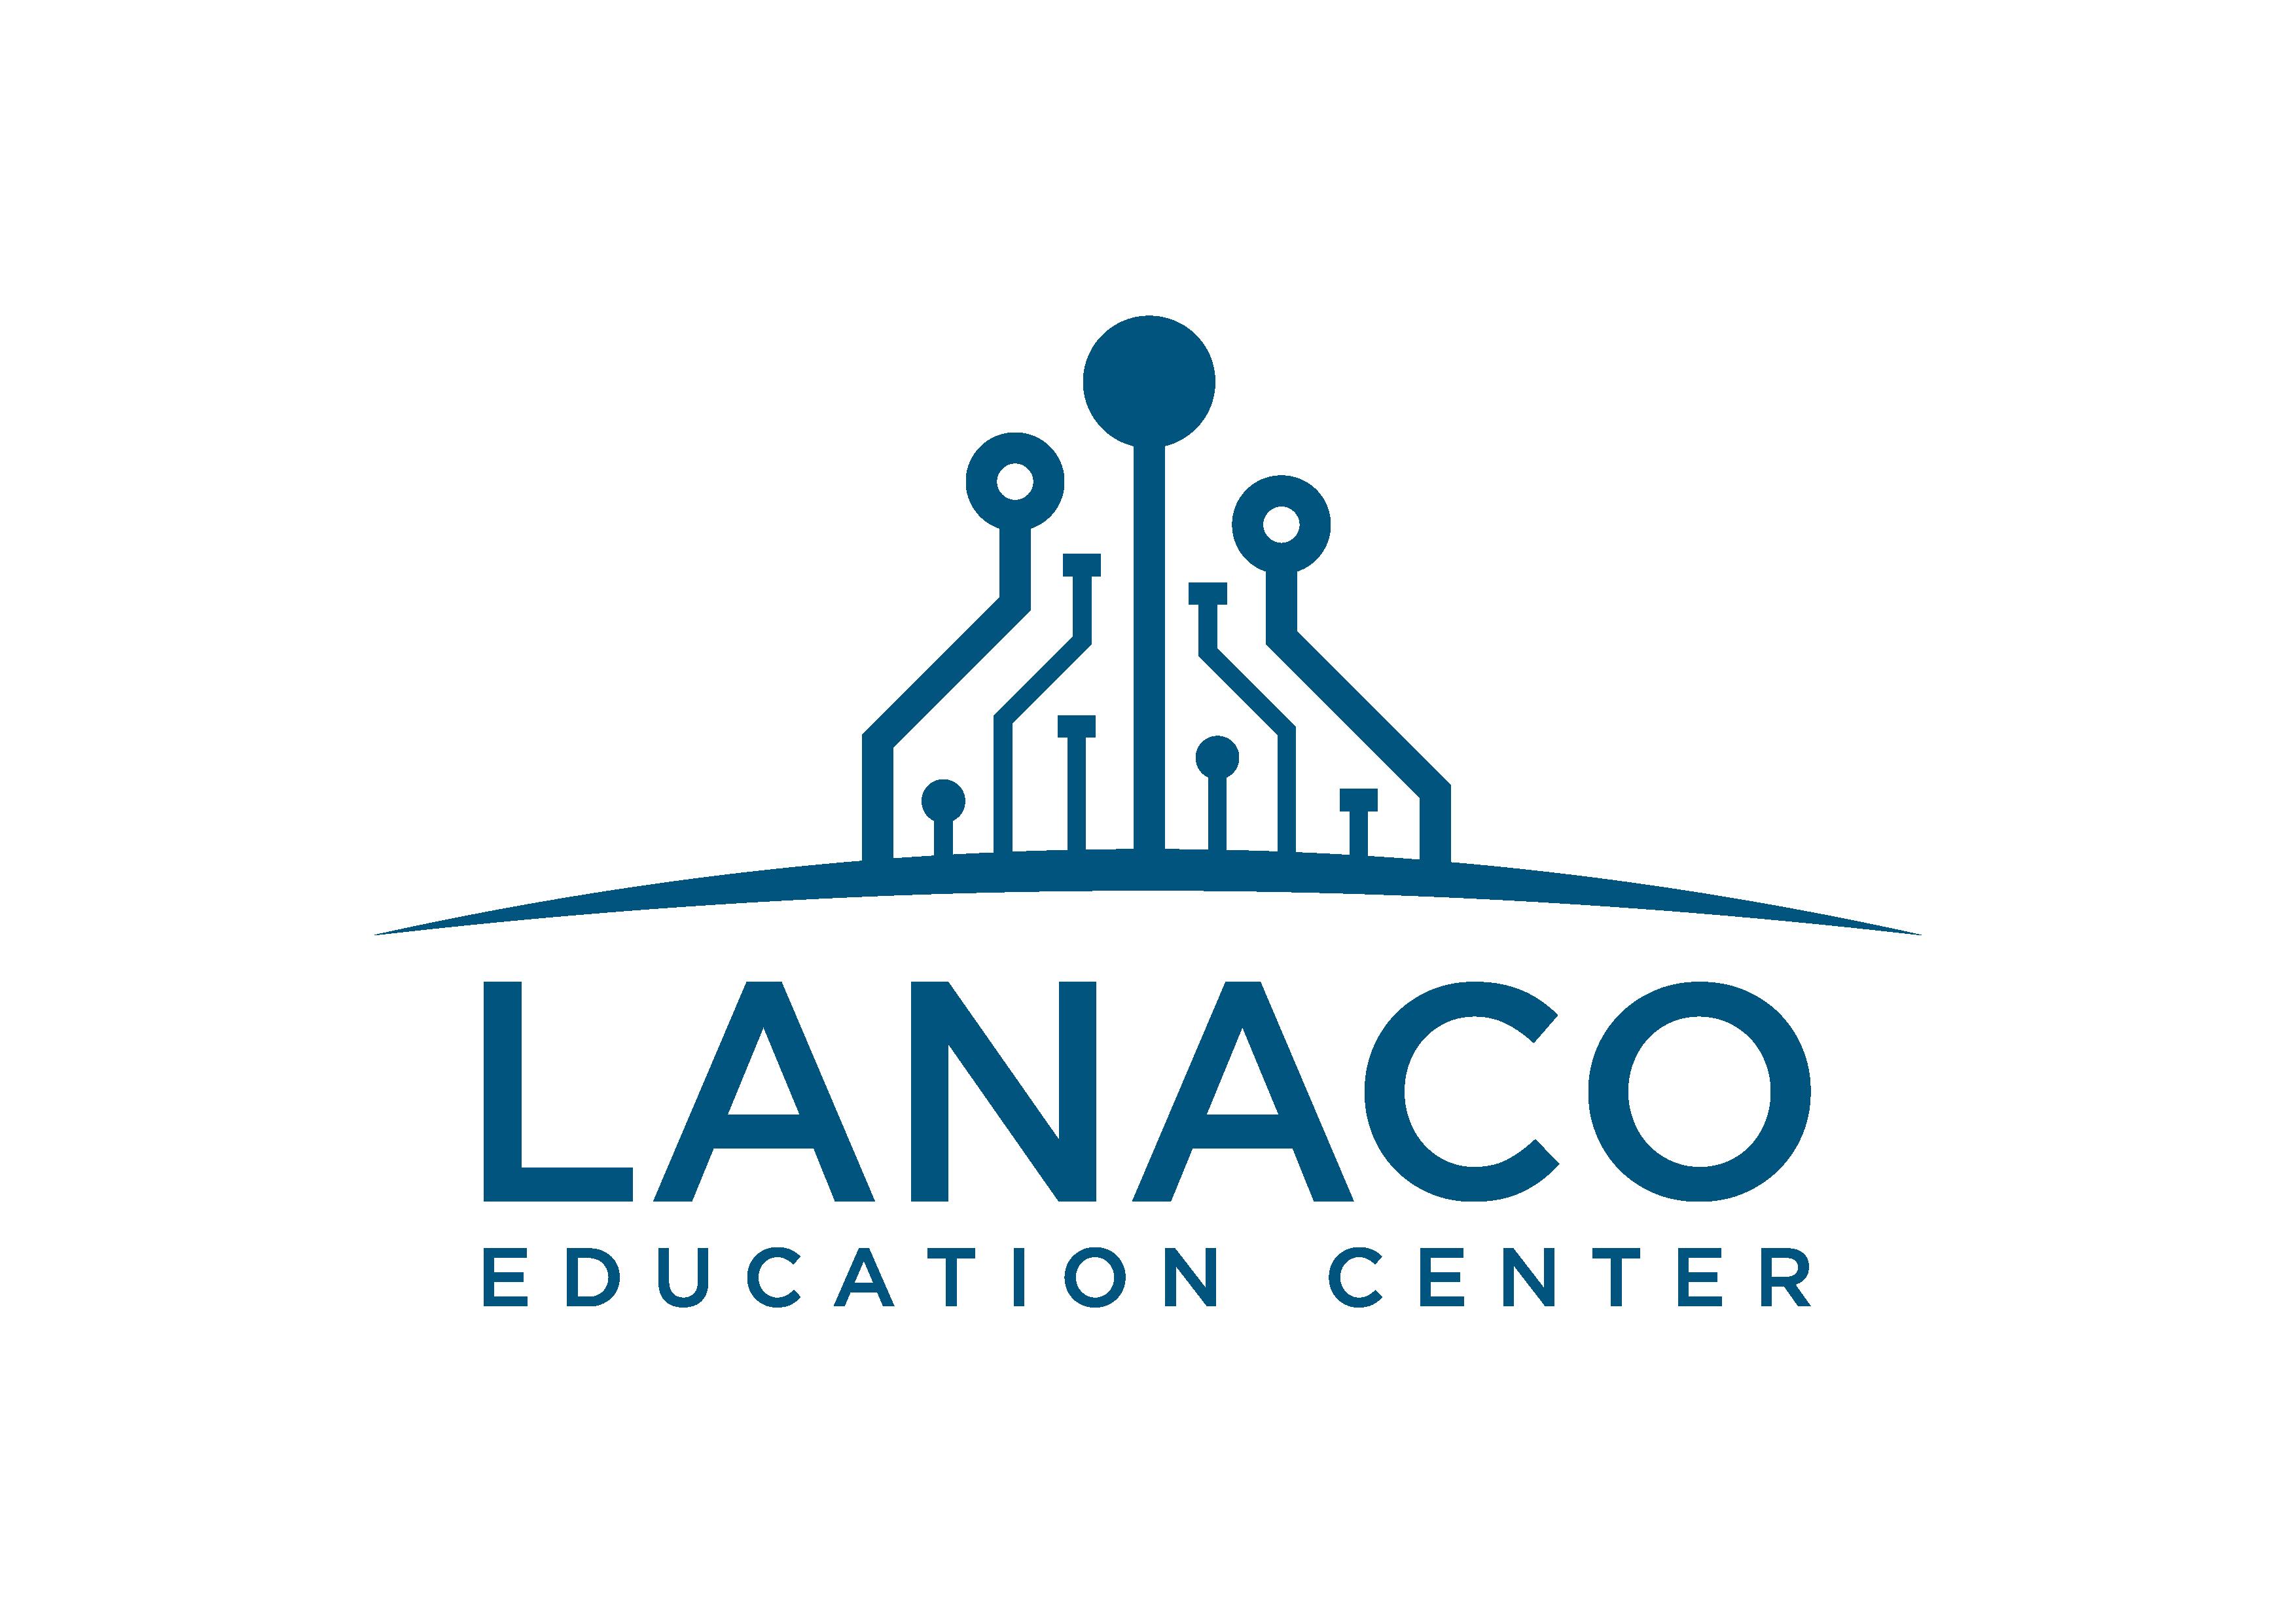 Lanaco Education Center